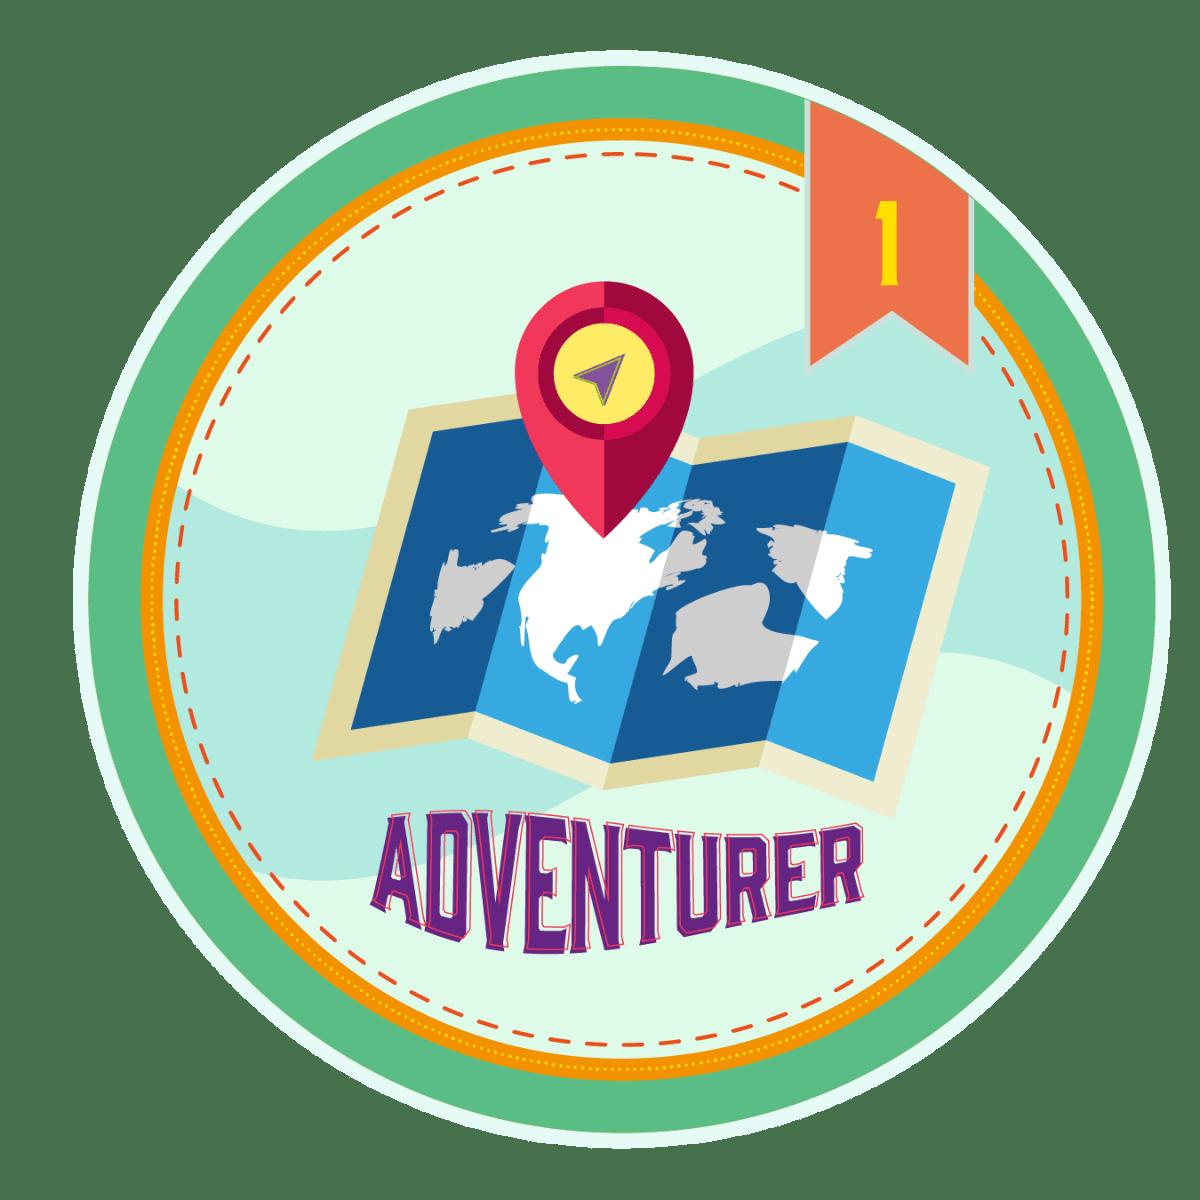 Adventurer Level 1